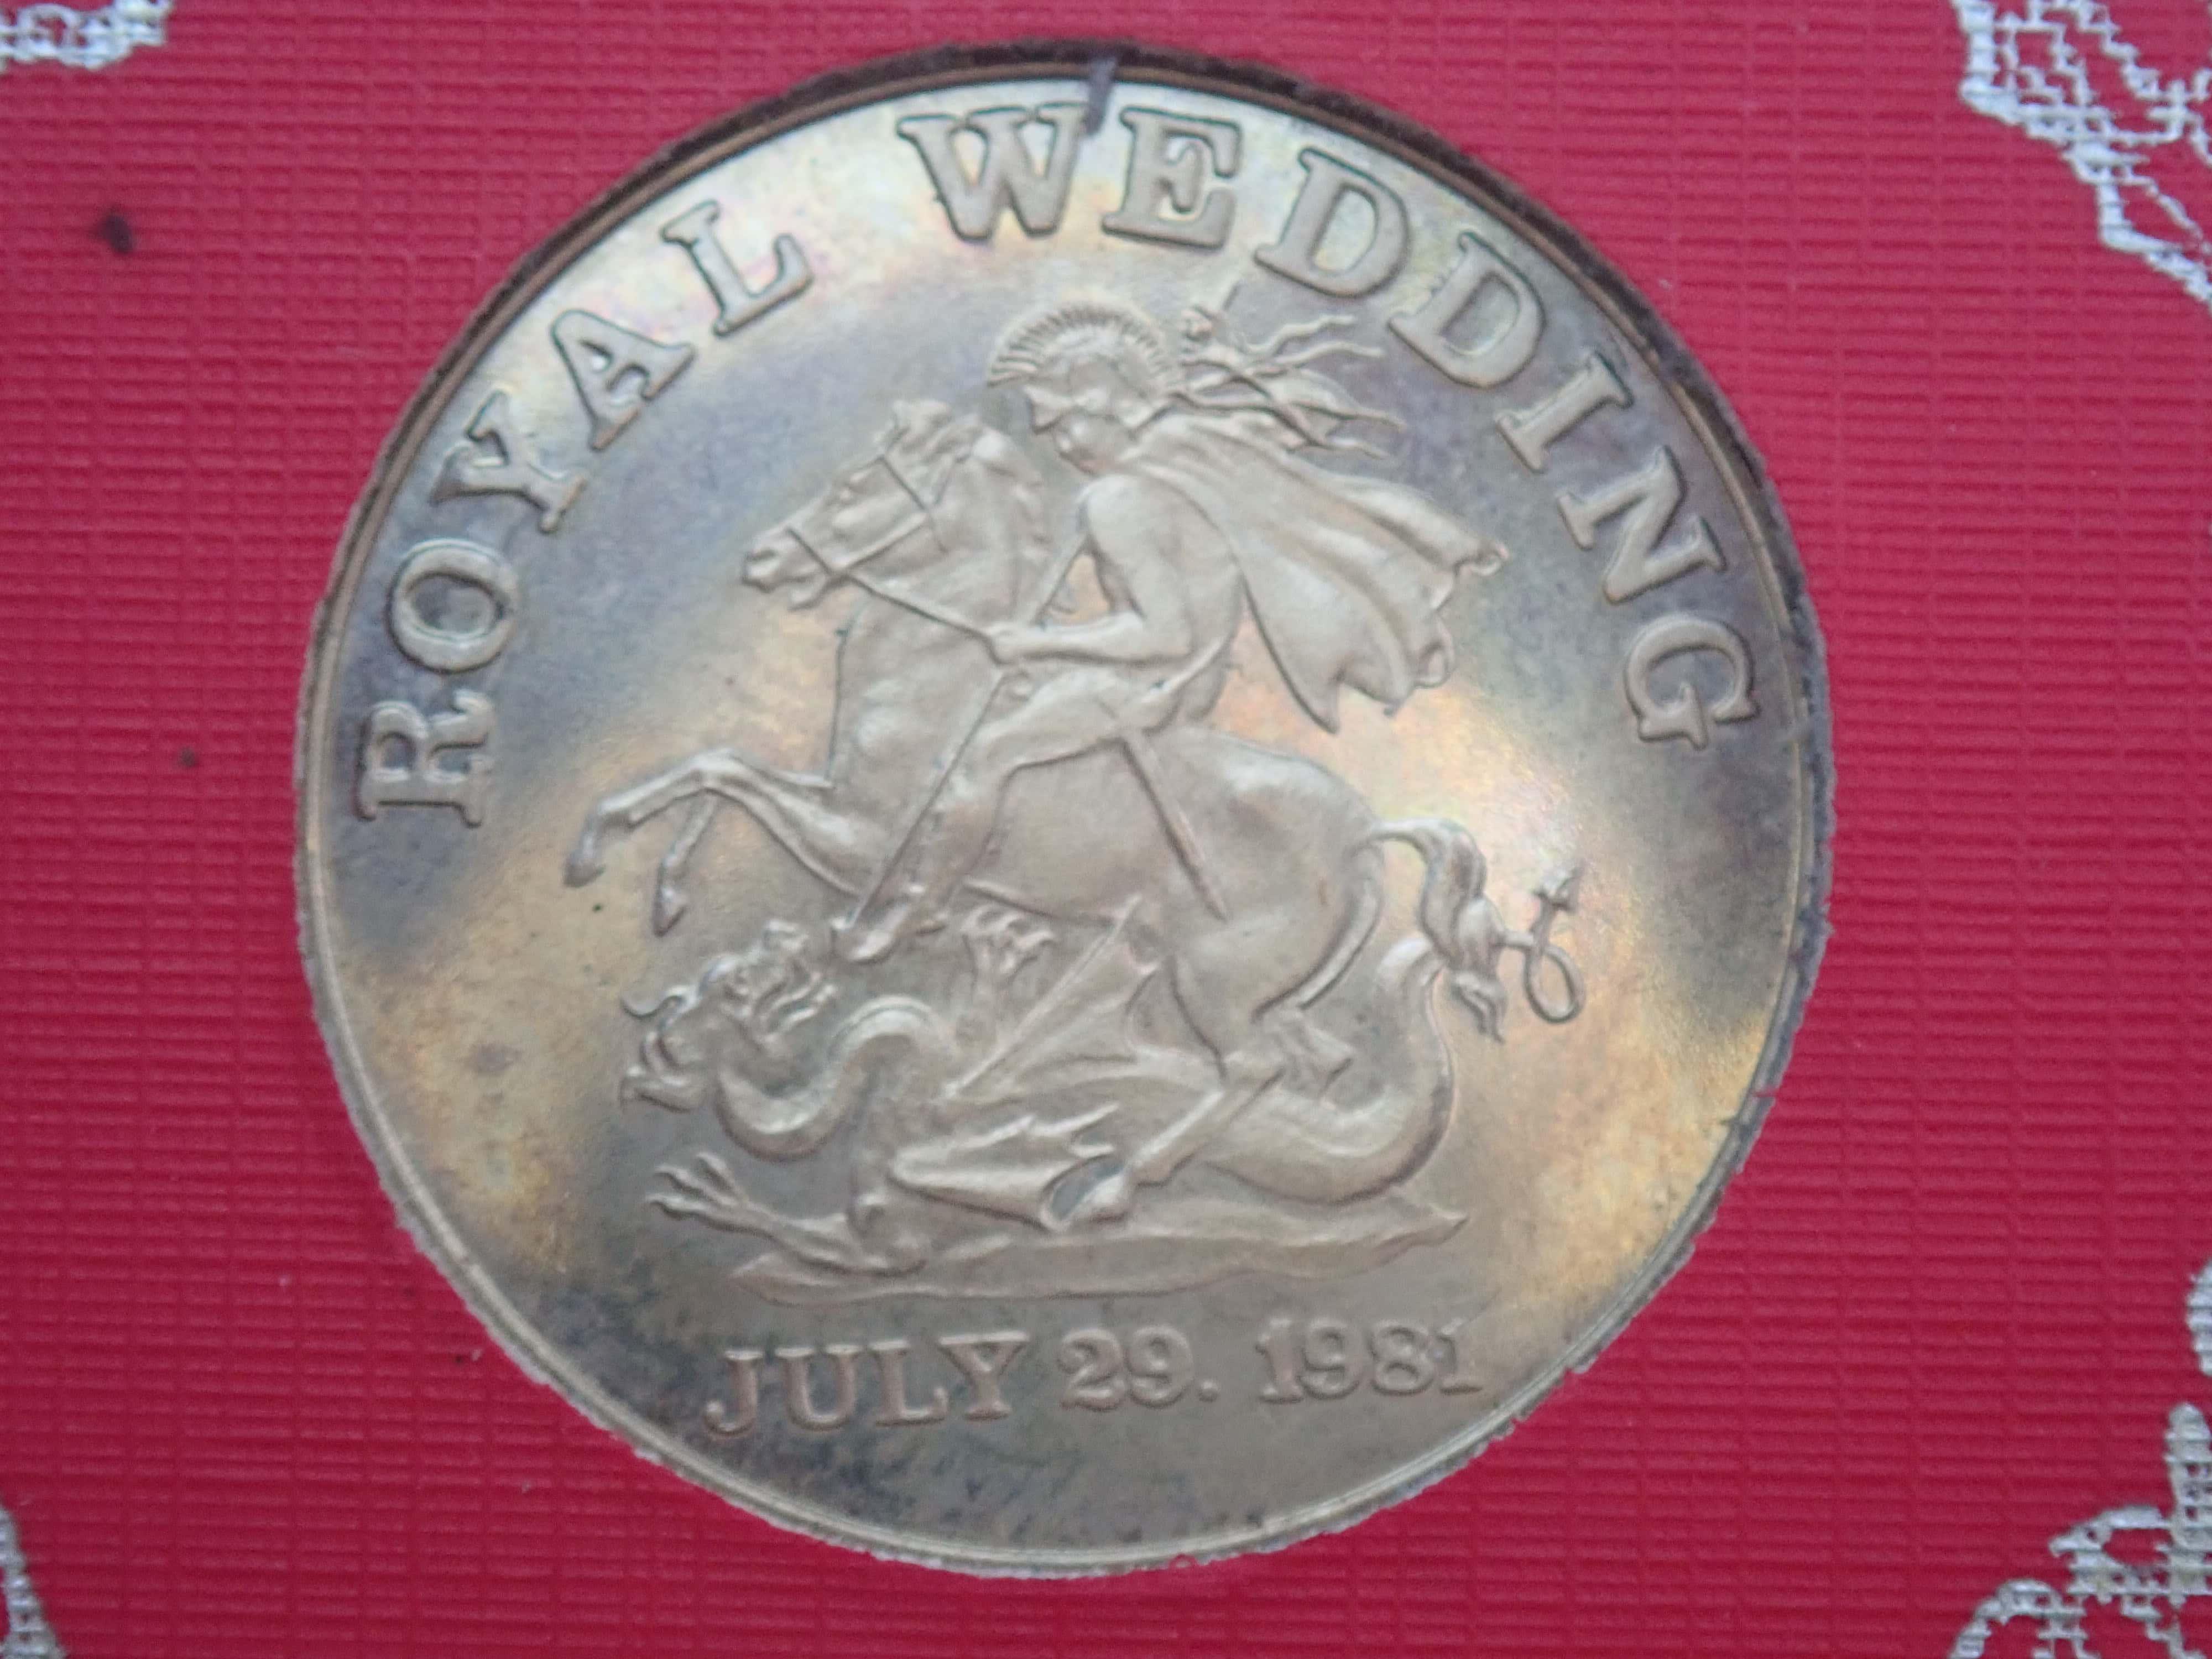 AZZ00811 - Charles & Diana Royal Wedding 9ct Gold Souvenir Medal,  July 29th 1981, 4gms,